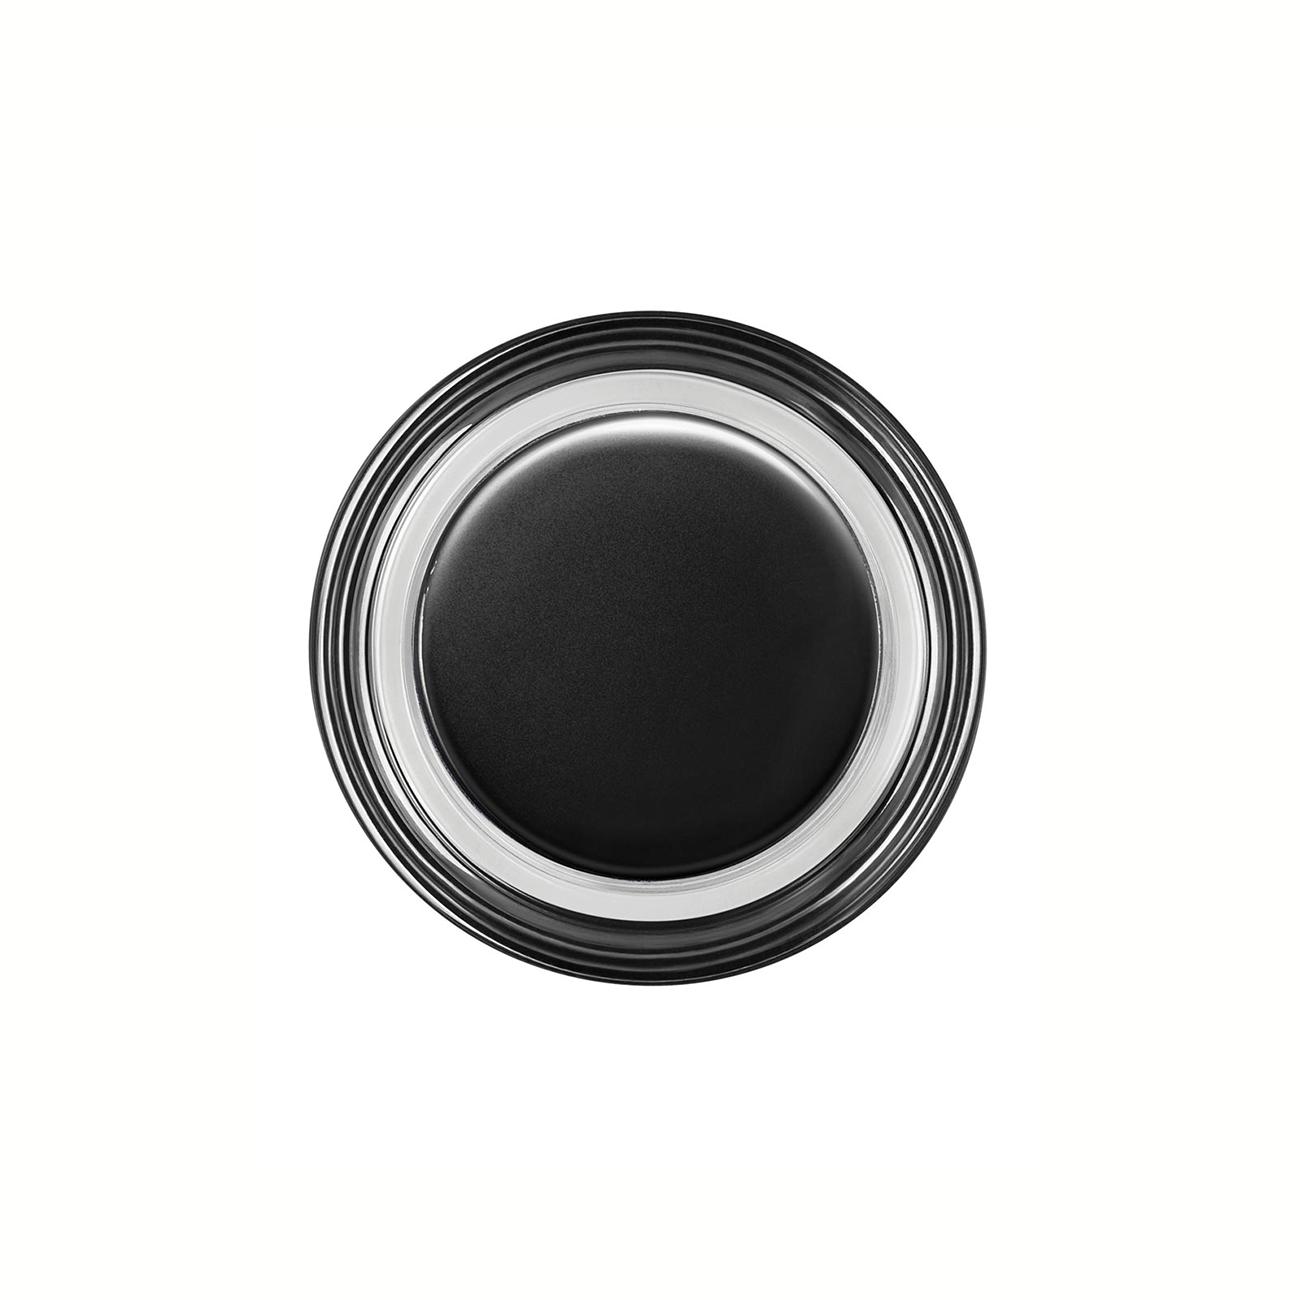 Eye & Brow Maestro 1 5gr Giorgio Armani imagine 2021 bestvalue.eu